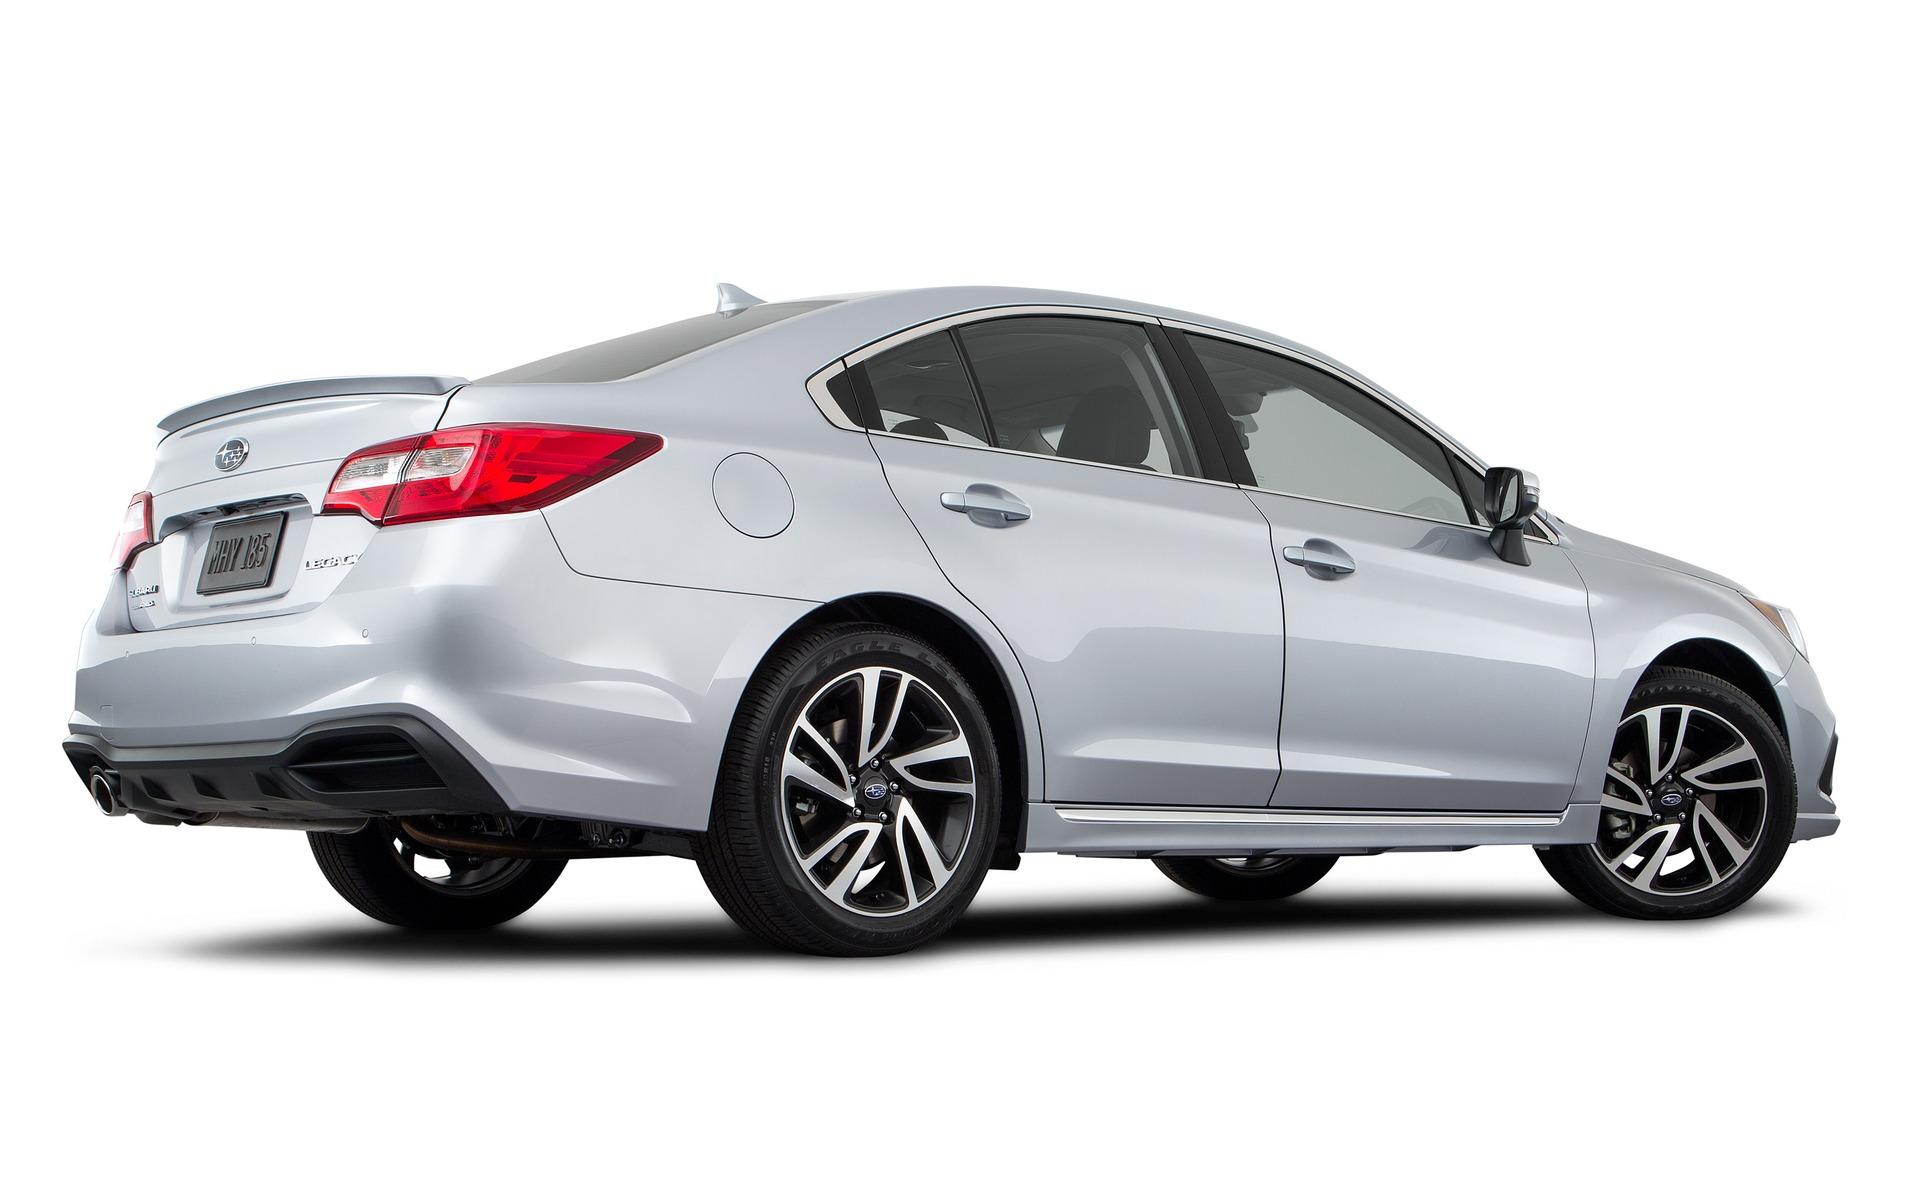 Improvements for the 2018 Subaru Legacy - 11/29